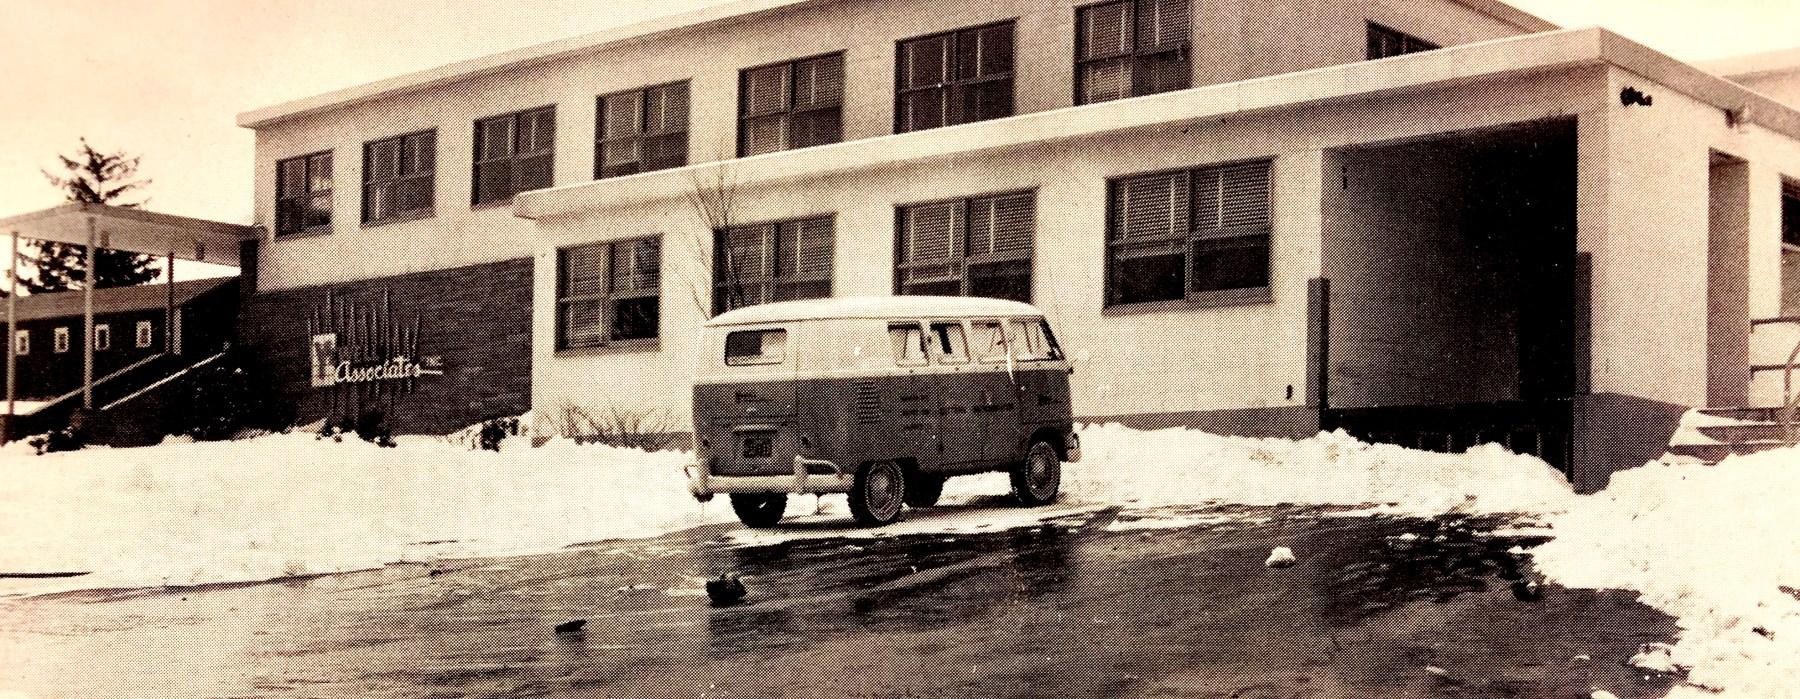 Yewell Associates, Burlington, MA